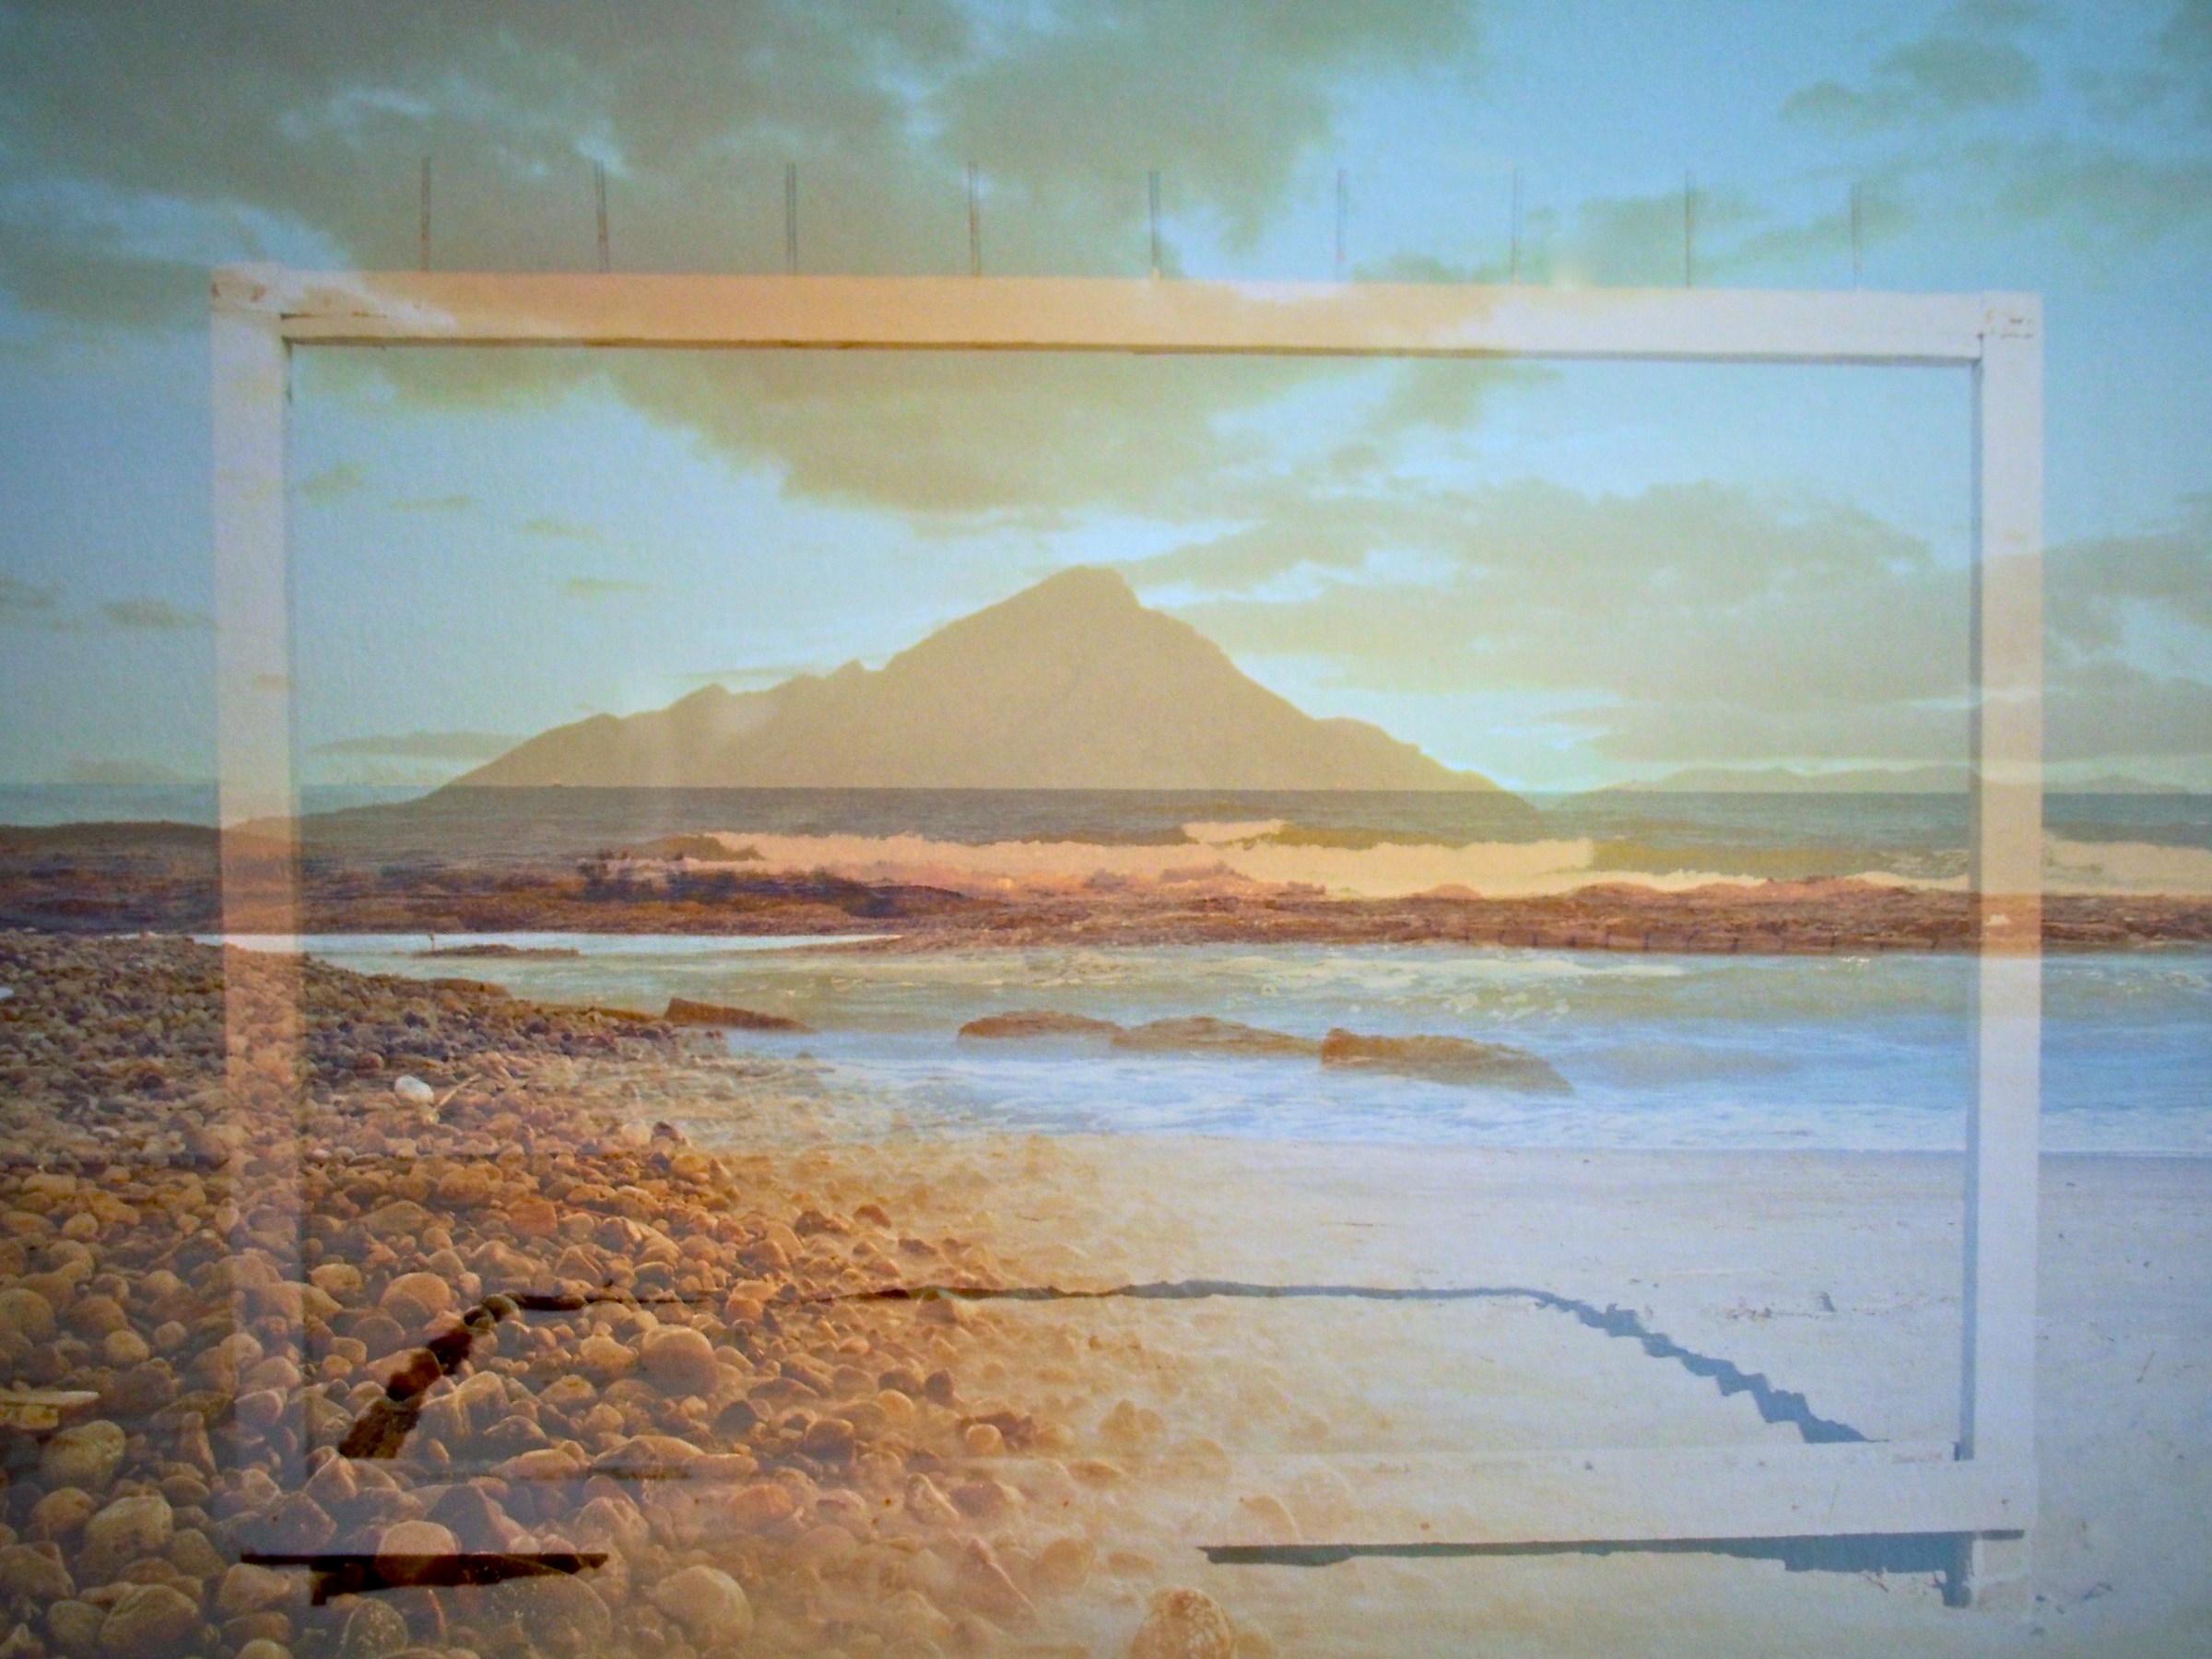 Chiaramonte framed Ghirri n. 3...